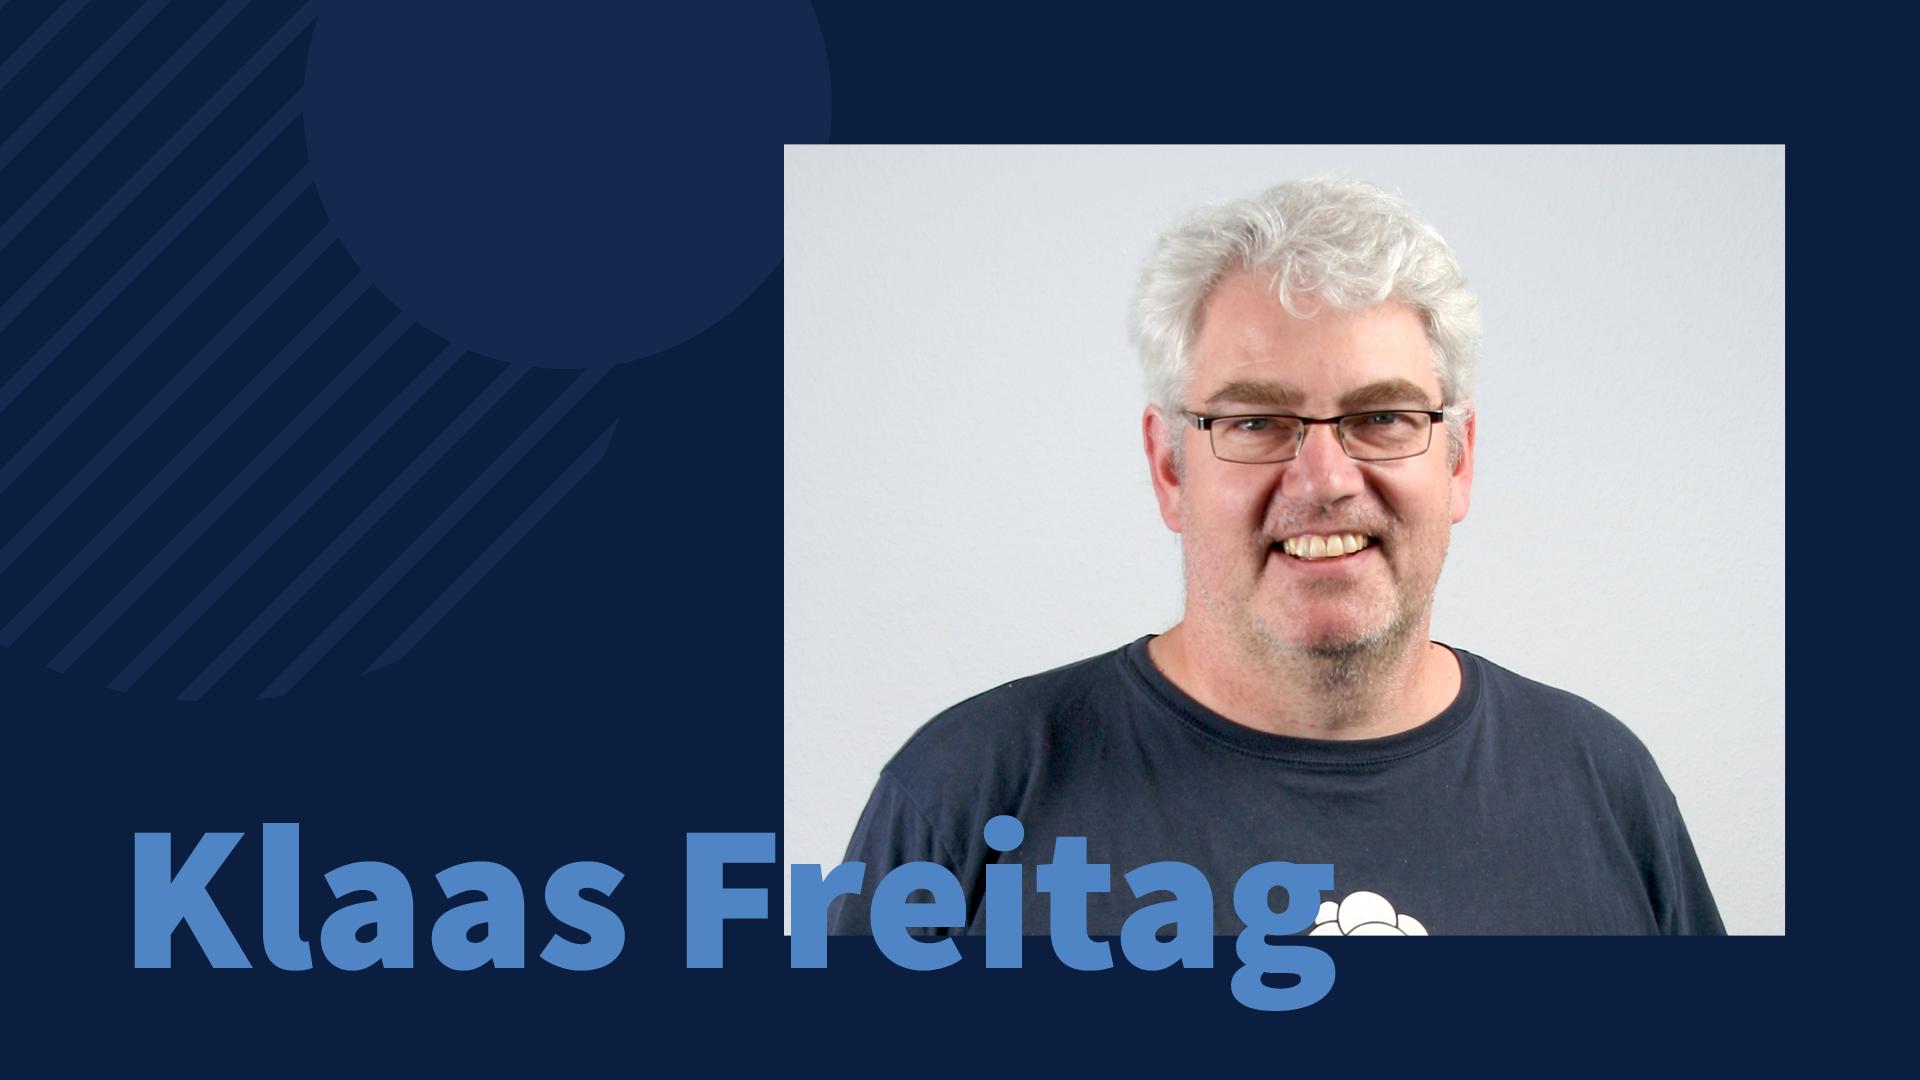 Klaas Freitag, CTO at ownCloud